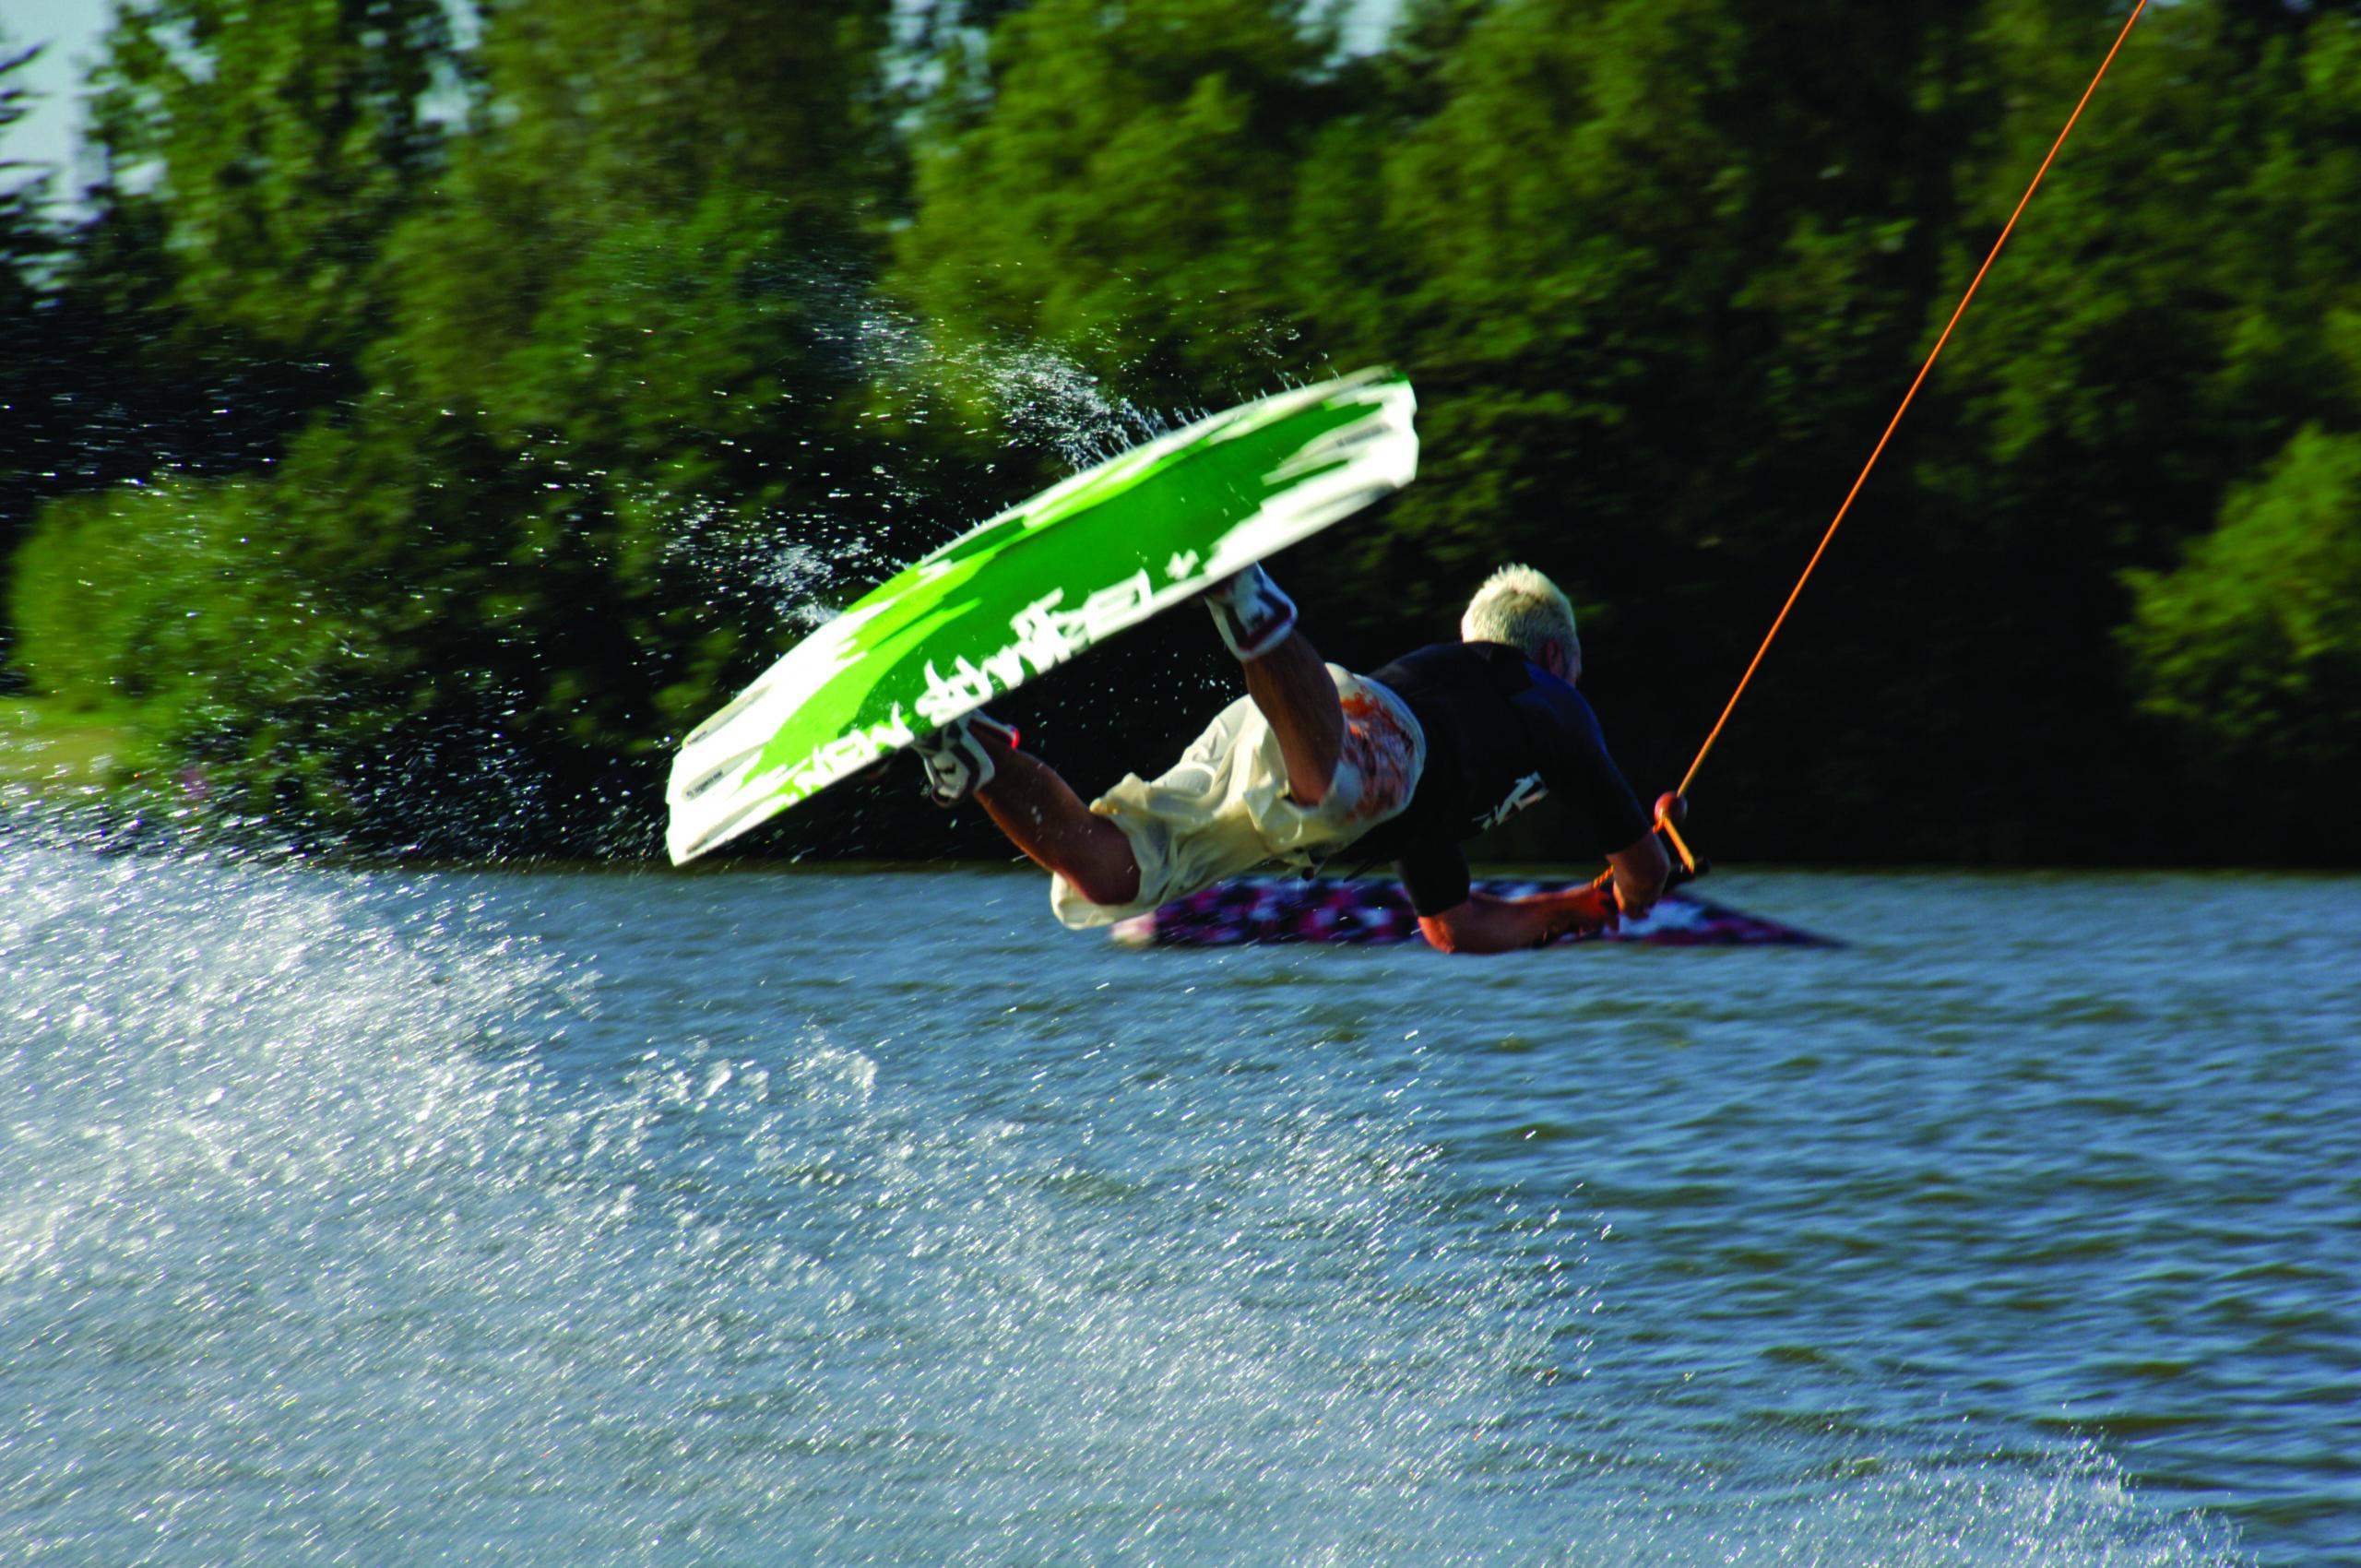 Willen Lake Wakeboarding